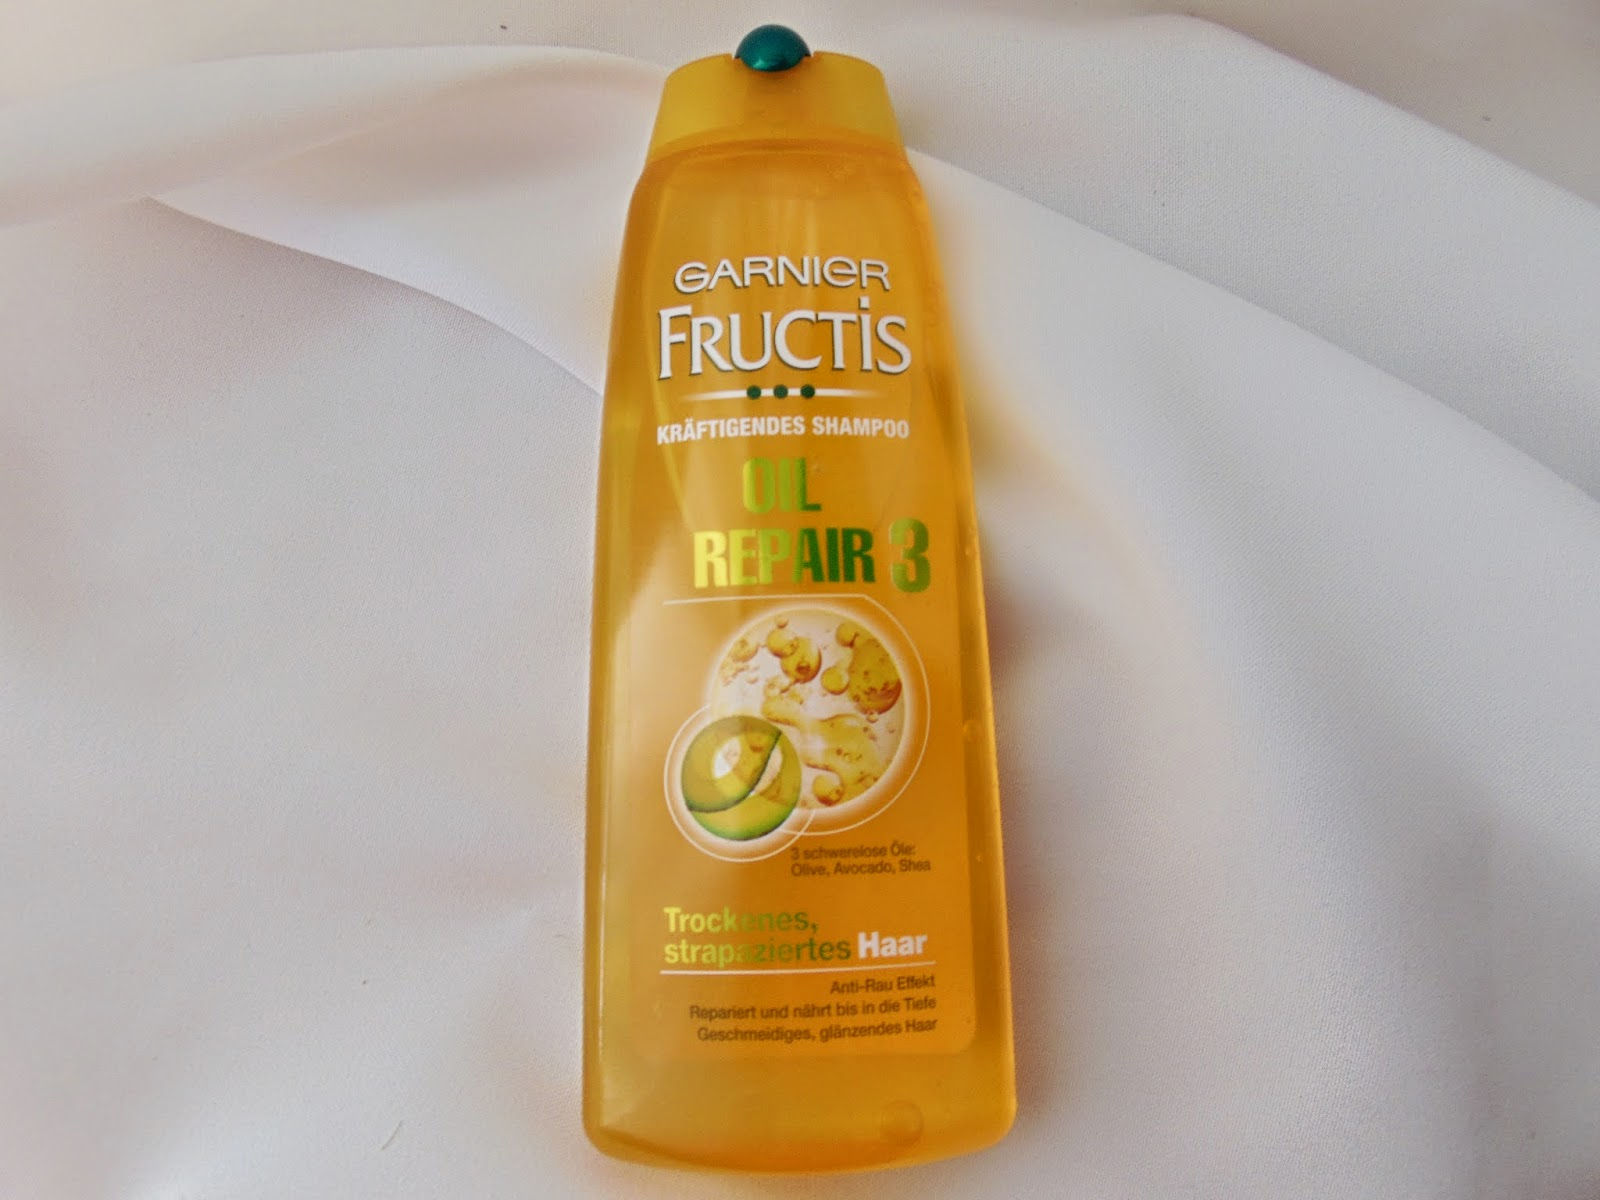 Garnier Fructis - Oil Repair 3 - www.annitschkasblog.de